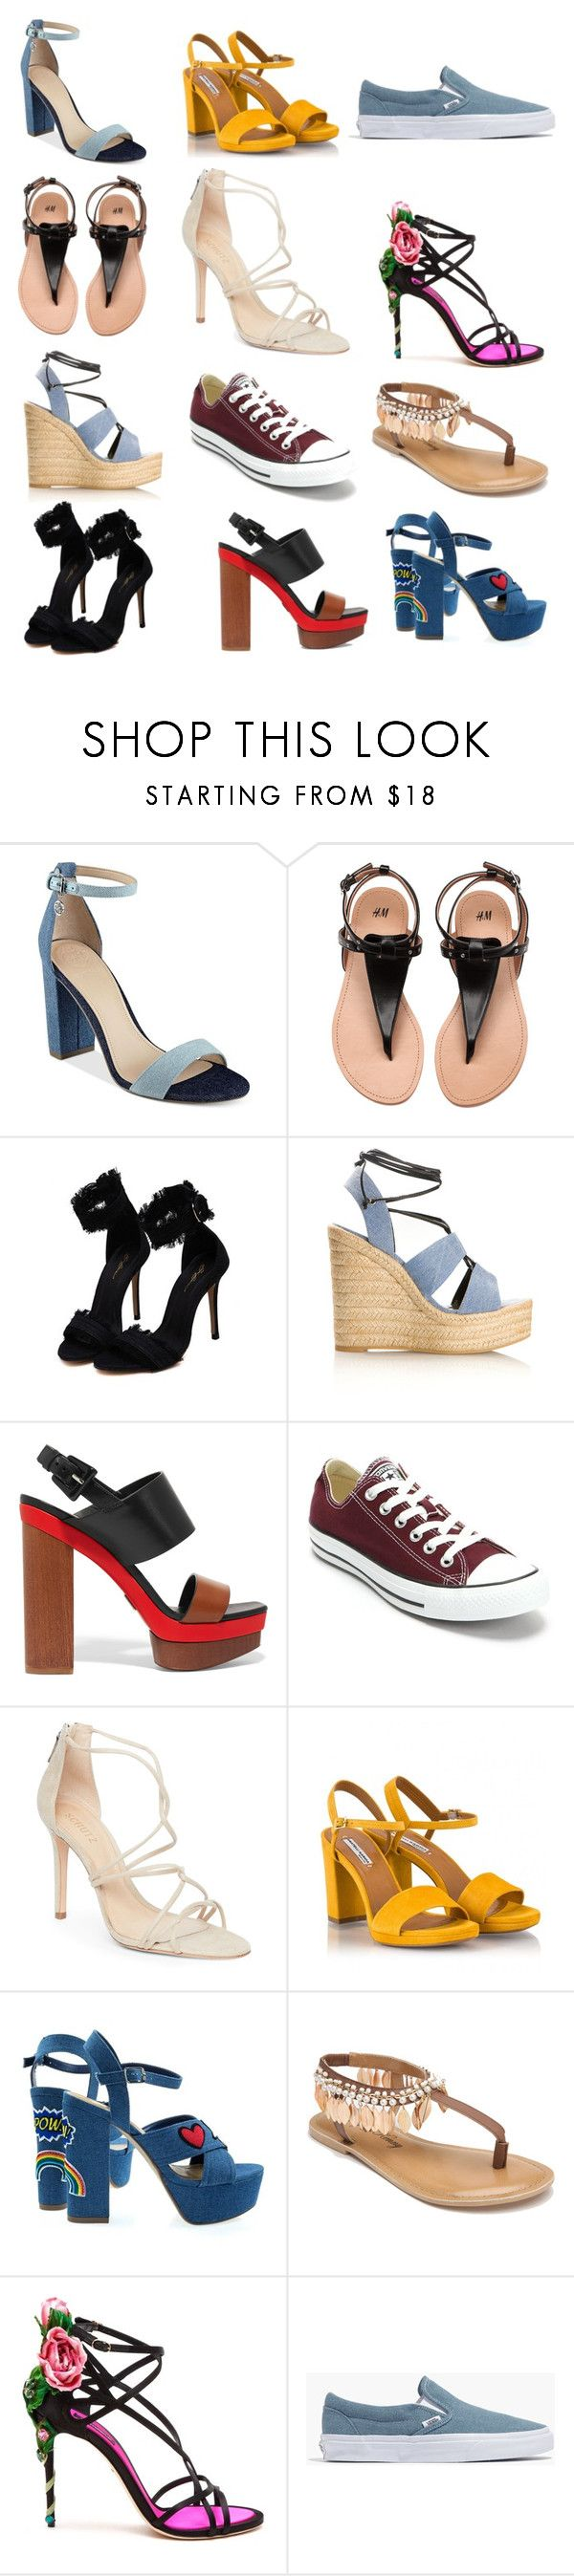 """обувь2"" by tamaraatma on Polyvore featuring GUESS, Yves Saint Laurent, Michael Kors, Converse, Schutz, Fratelli Karida, Penny Loves Kenny, Dolce&Gabbana and Madewell"